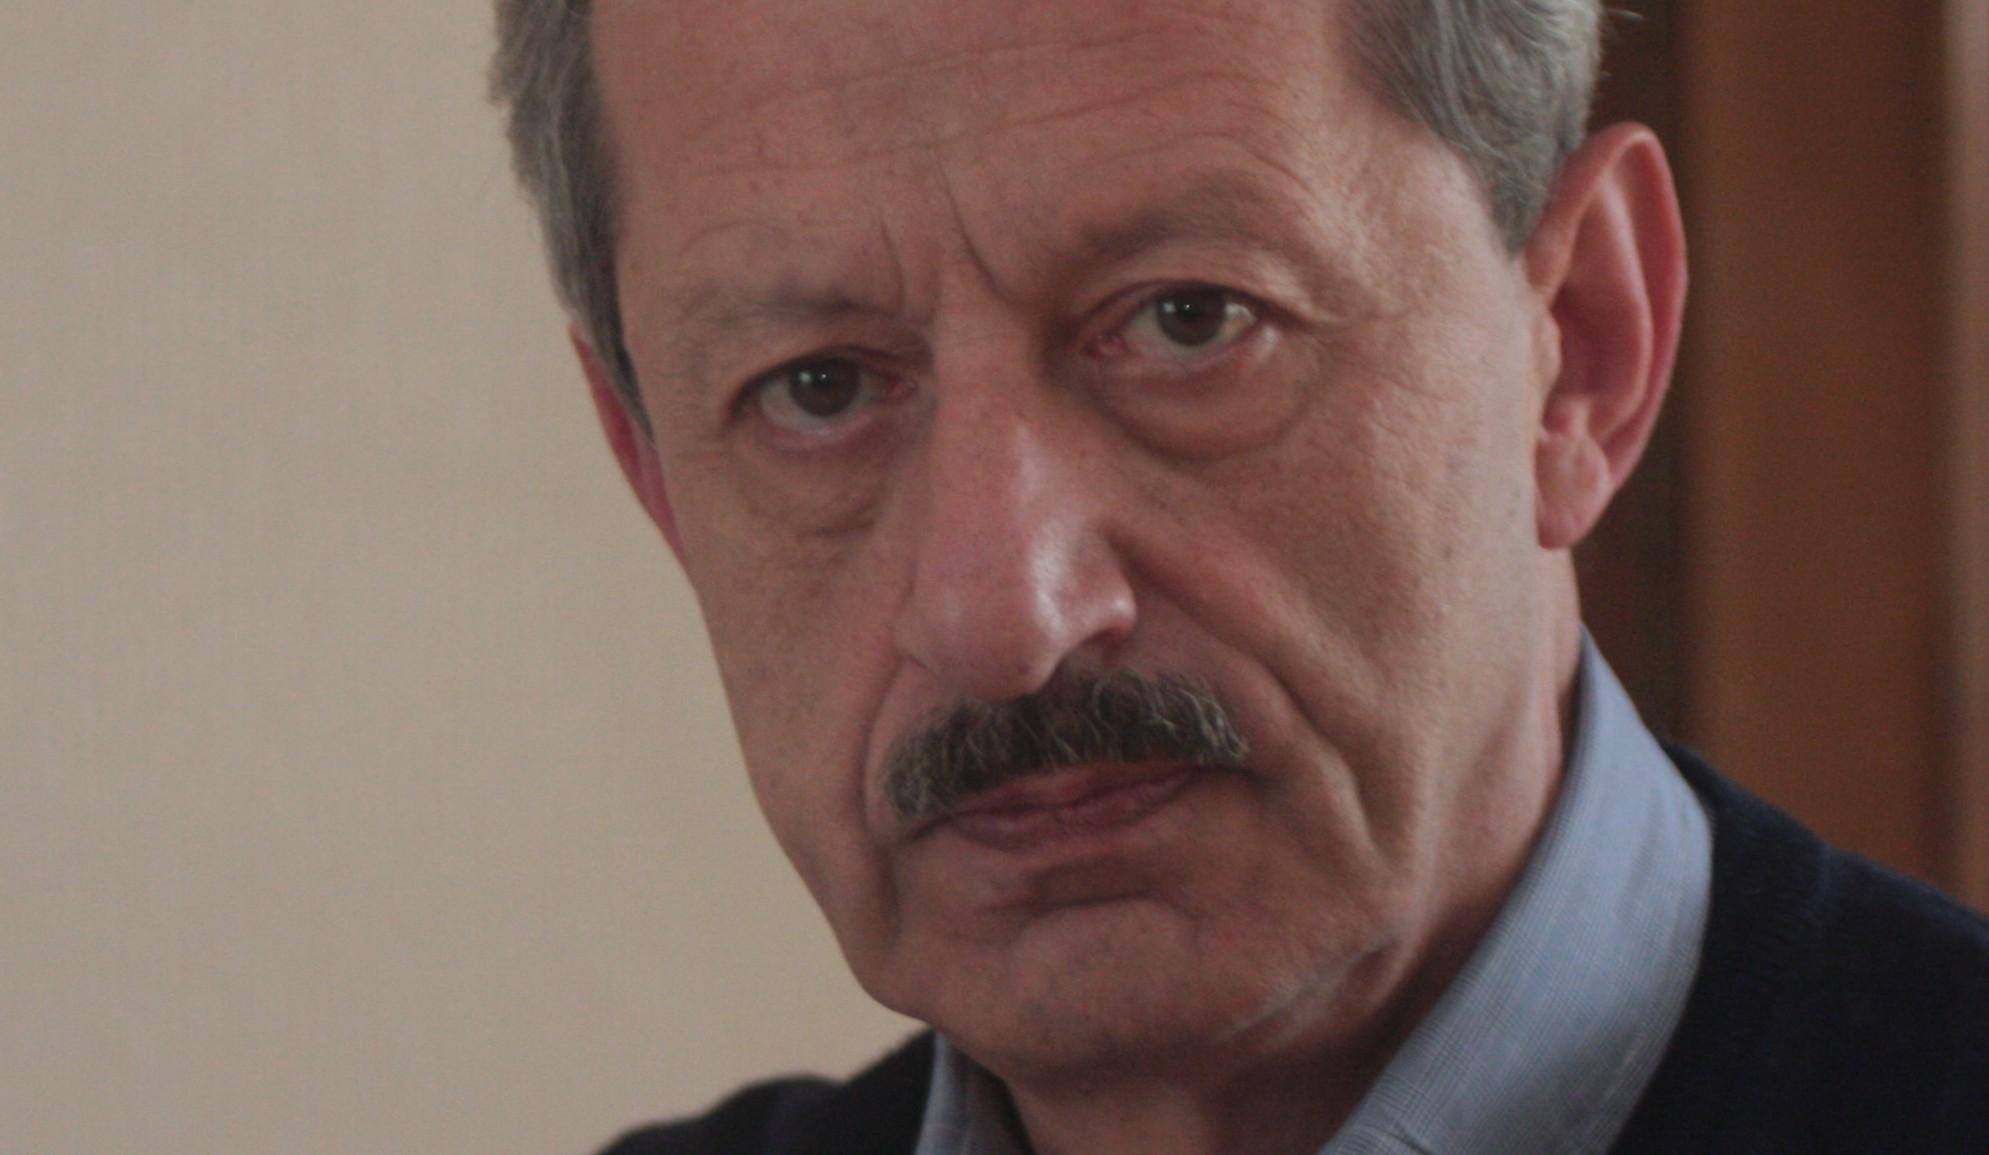 Vakhtang Kikabidze denied rumors about his death 27.07.2012 13